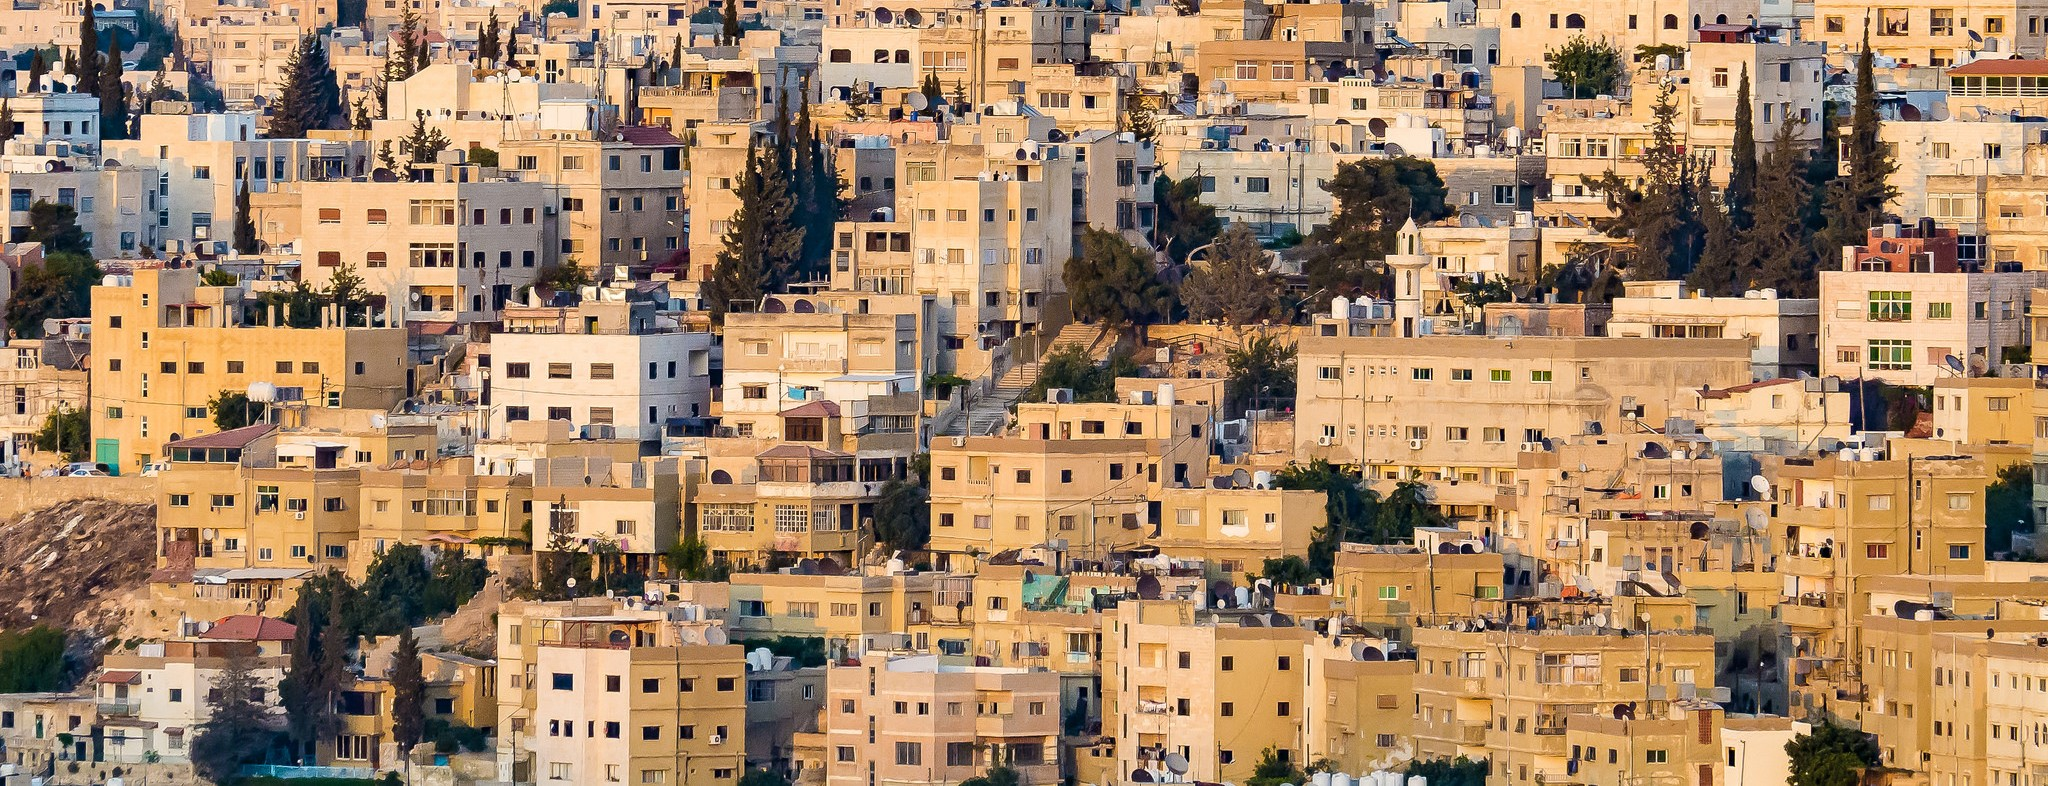 Amman, Jordan, June 2015 (Photo: Flickr/Edgardo W. Olivera)